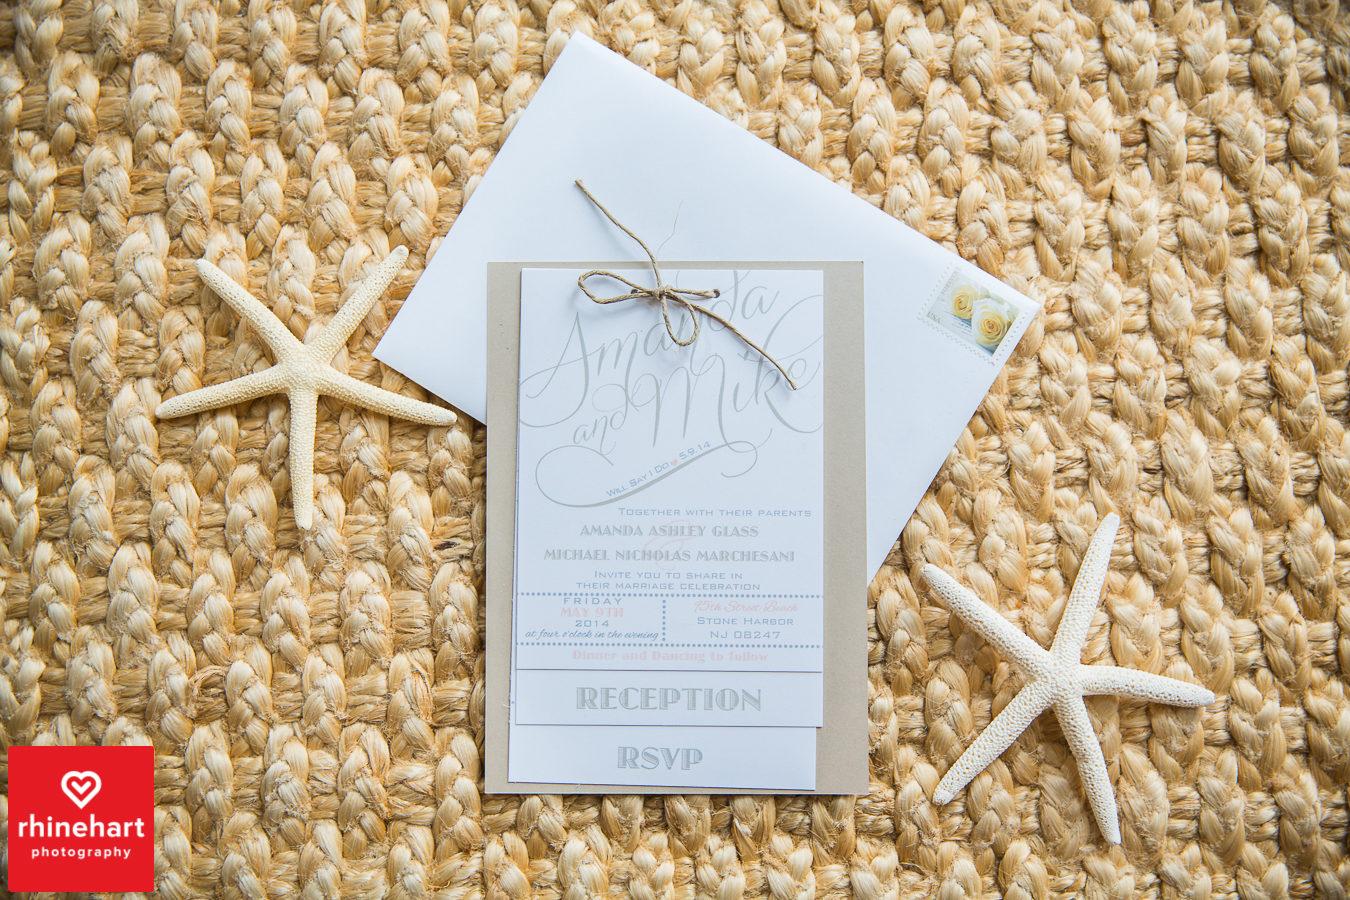 reeds-stone-harbor-wedding-photographer-102